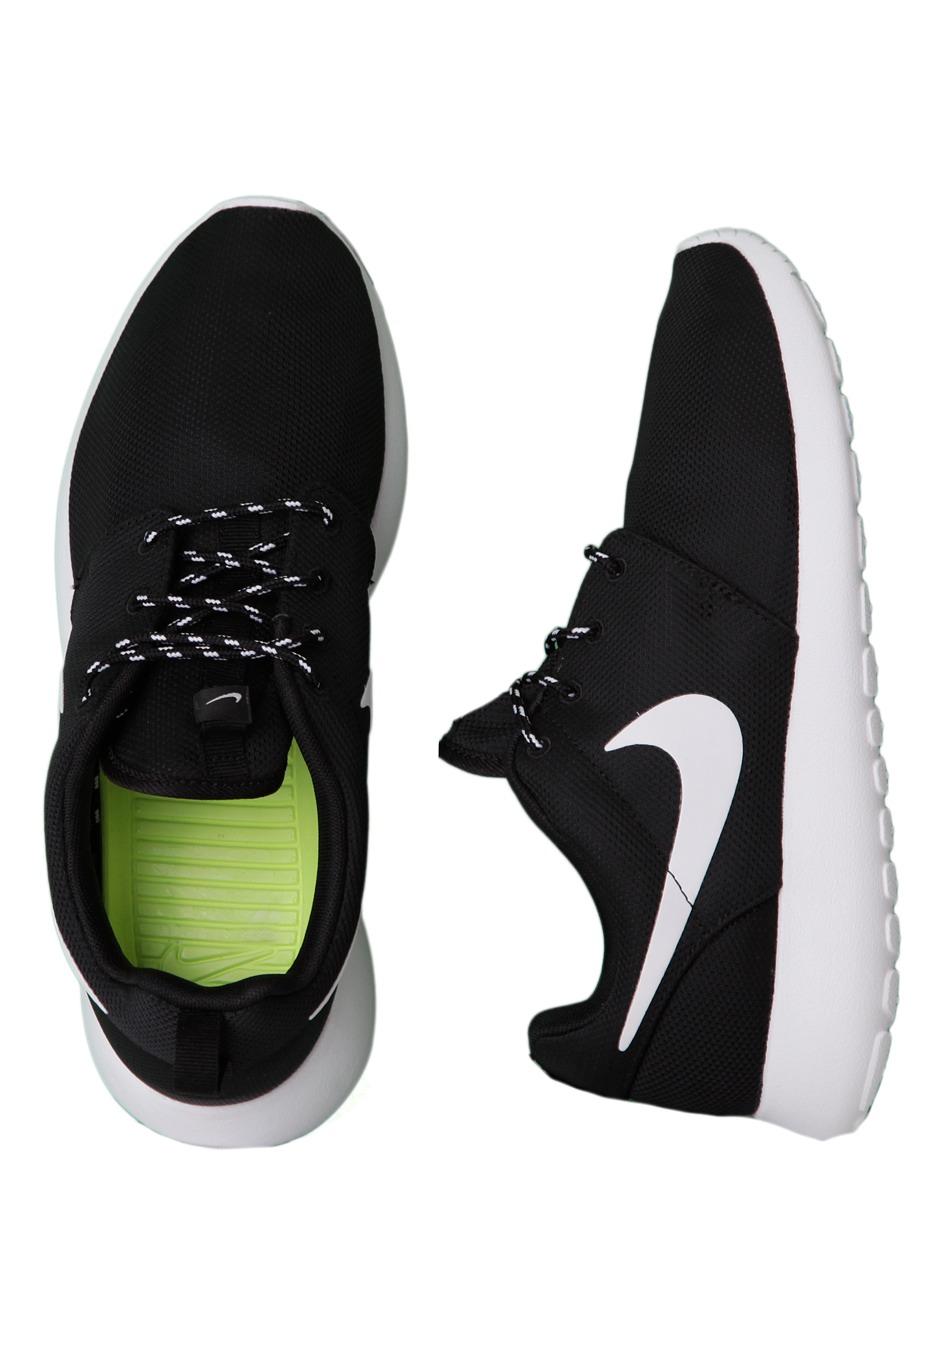 f6482c49e4ddbe Nike - Roshe Run Black White Volt - Girl Shoes